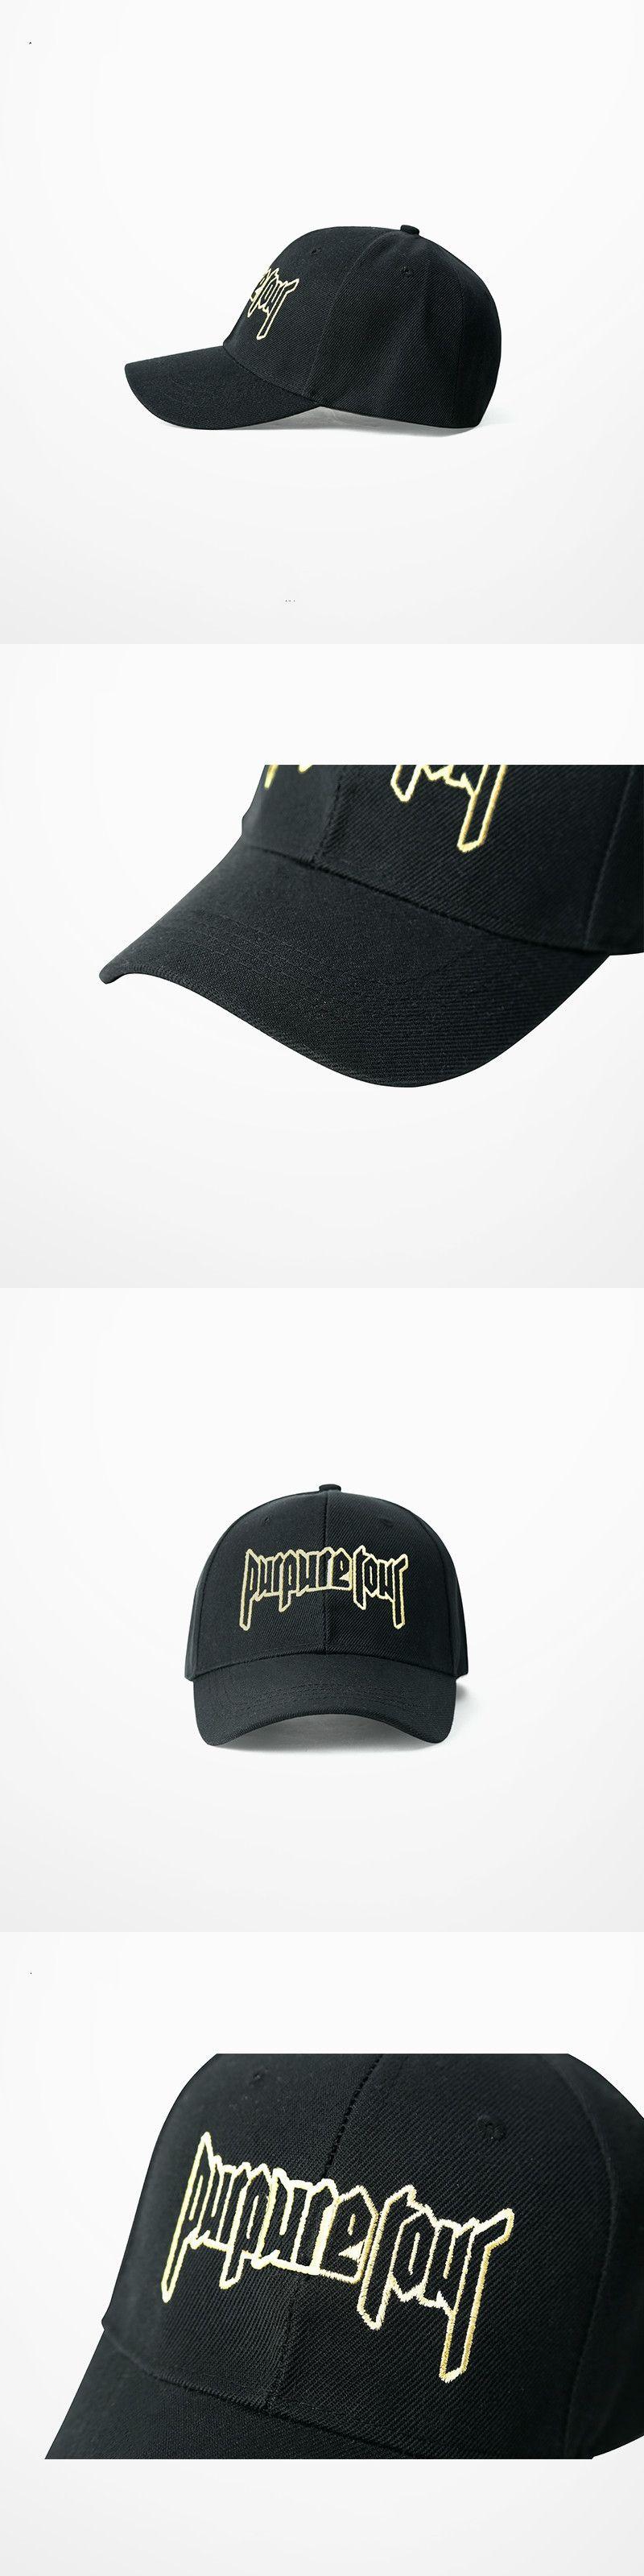 Purpose Tour Embroidered Baseball Hip Hop Cap Vintage Retro Justin Bieber  Hat High Street Dark Tide b4e752583ab7